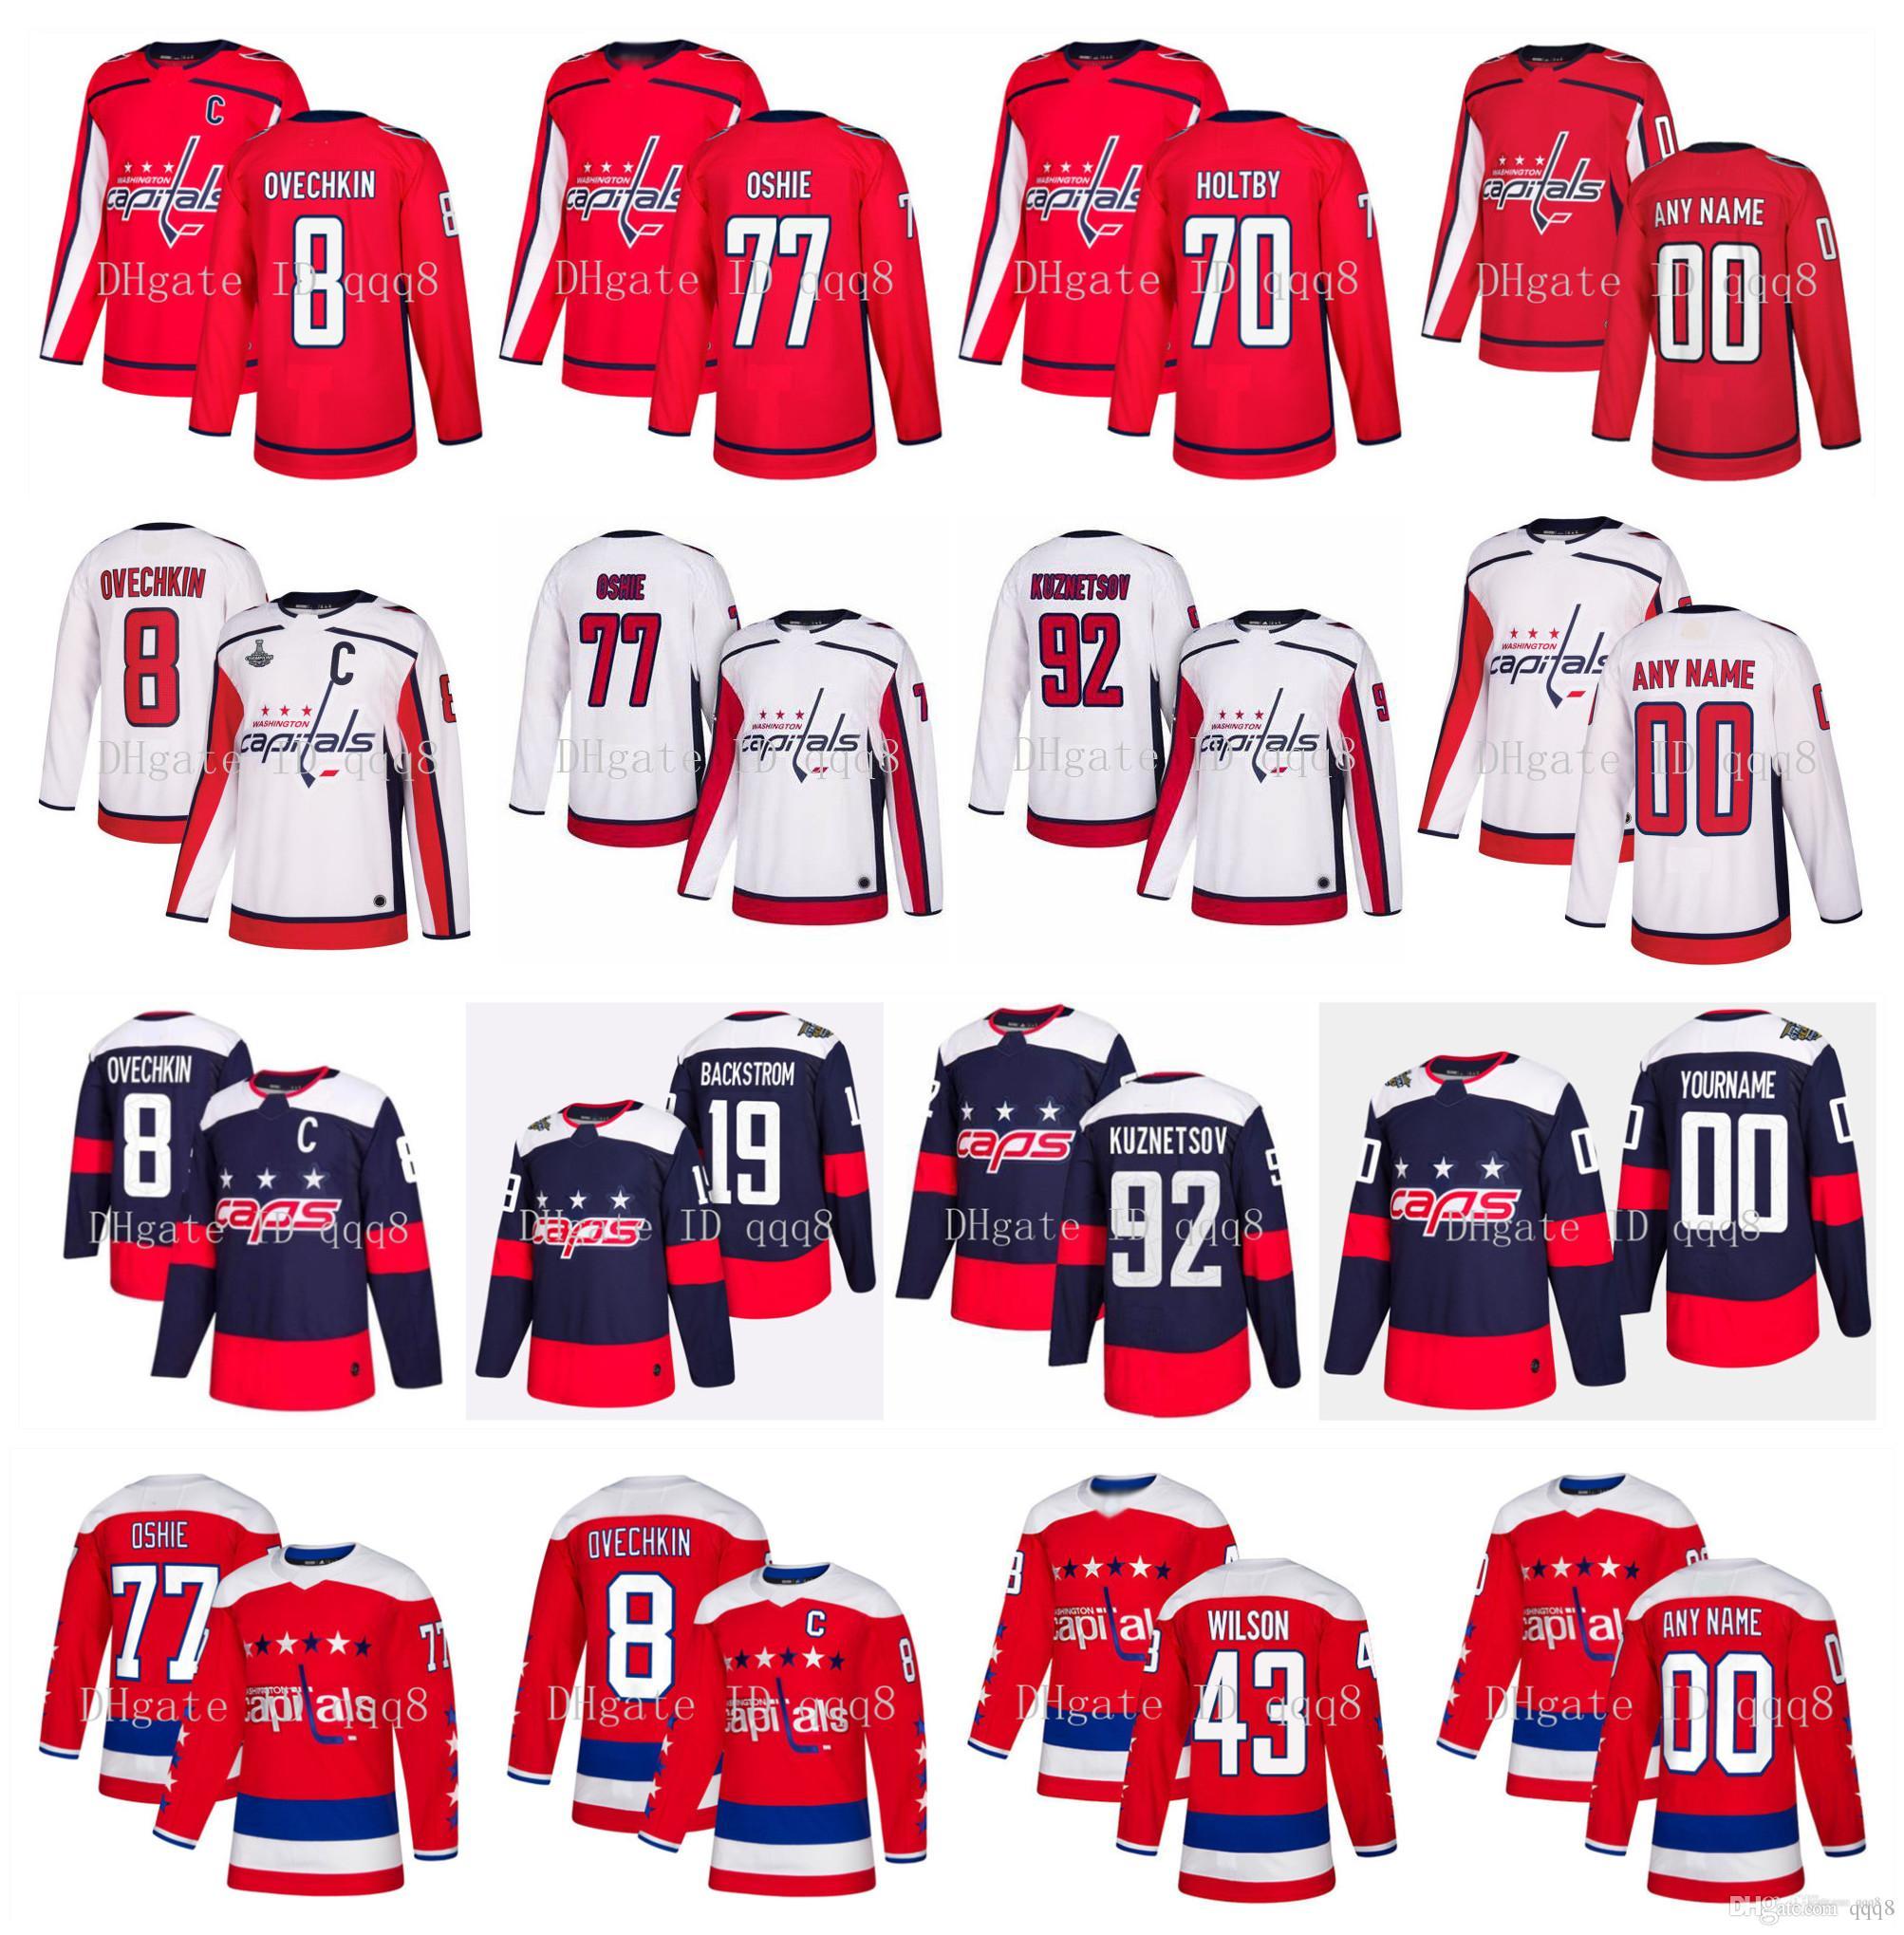 Washington Capitals Jersey 8 Alex Ovechkin 19 Nicklas Bäckström 43 Tom Wilson 92 Evgeny Kuznetsov 77 TJ Oshie 70 Braden Holtby Hockey Jersey